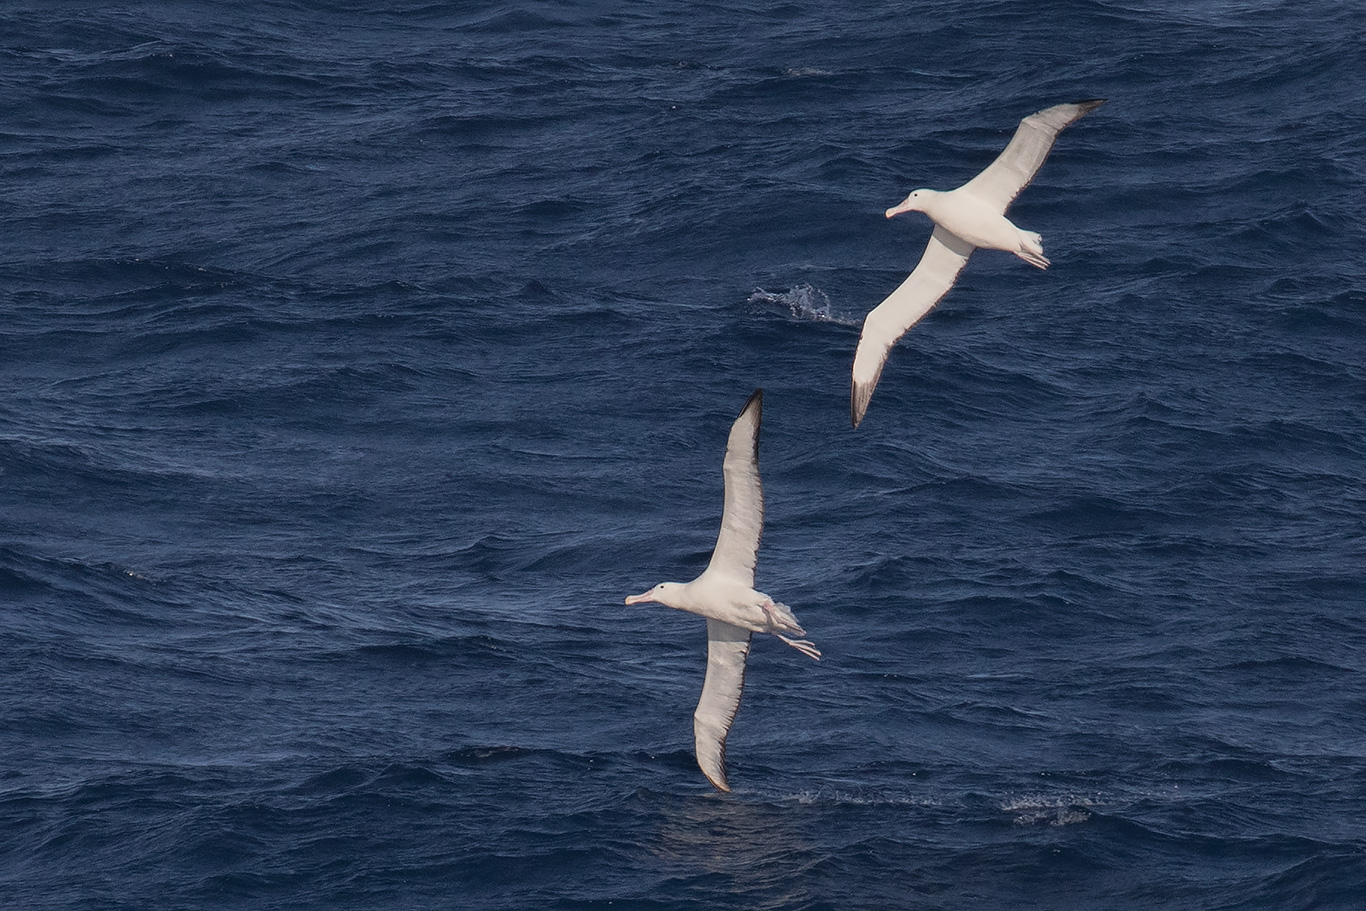 Royal Albatross, At sea, south of Falkland Islands and north of Antarctica, South Atlantic Ocean.